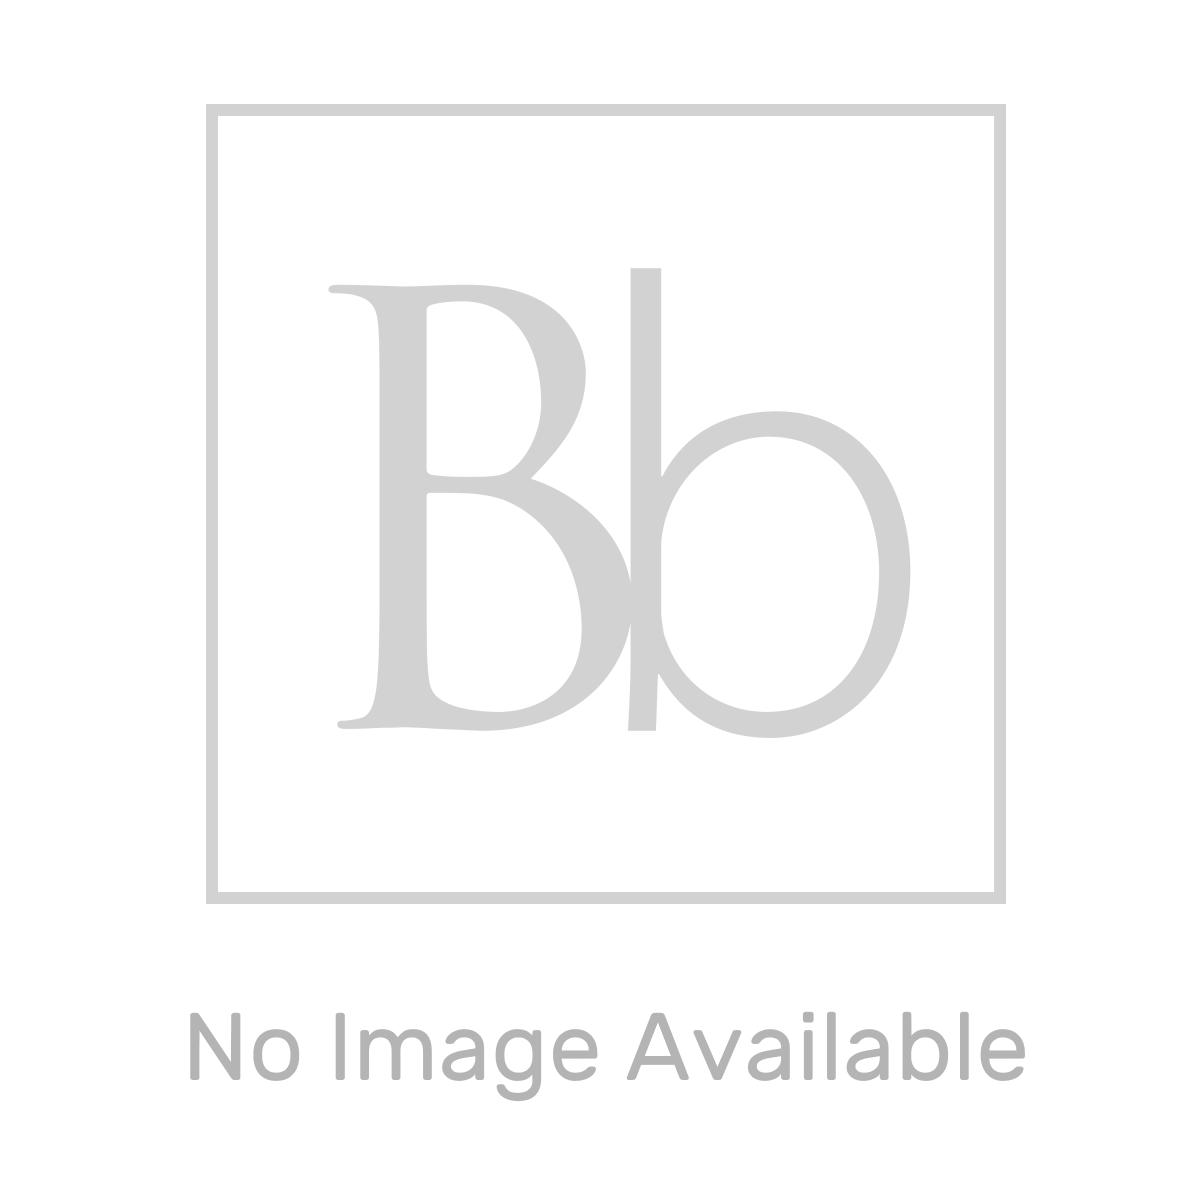 HiB Liberty Portrait LED Back-Lit Bathroom Mirror